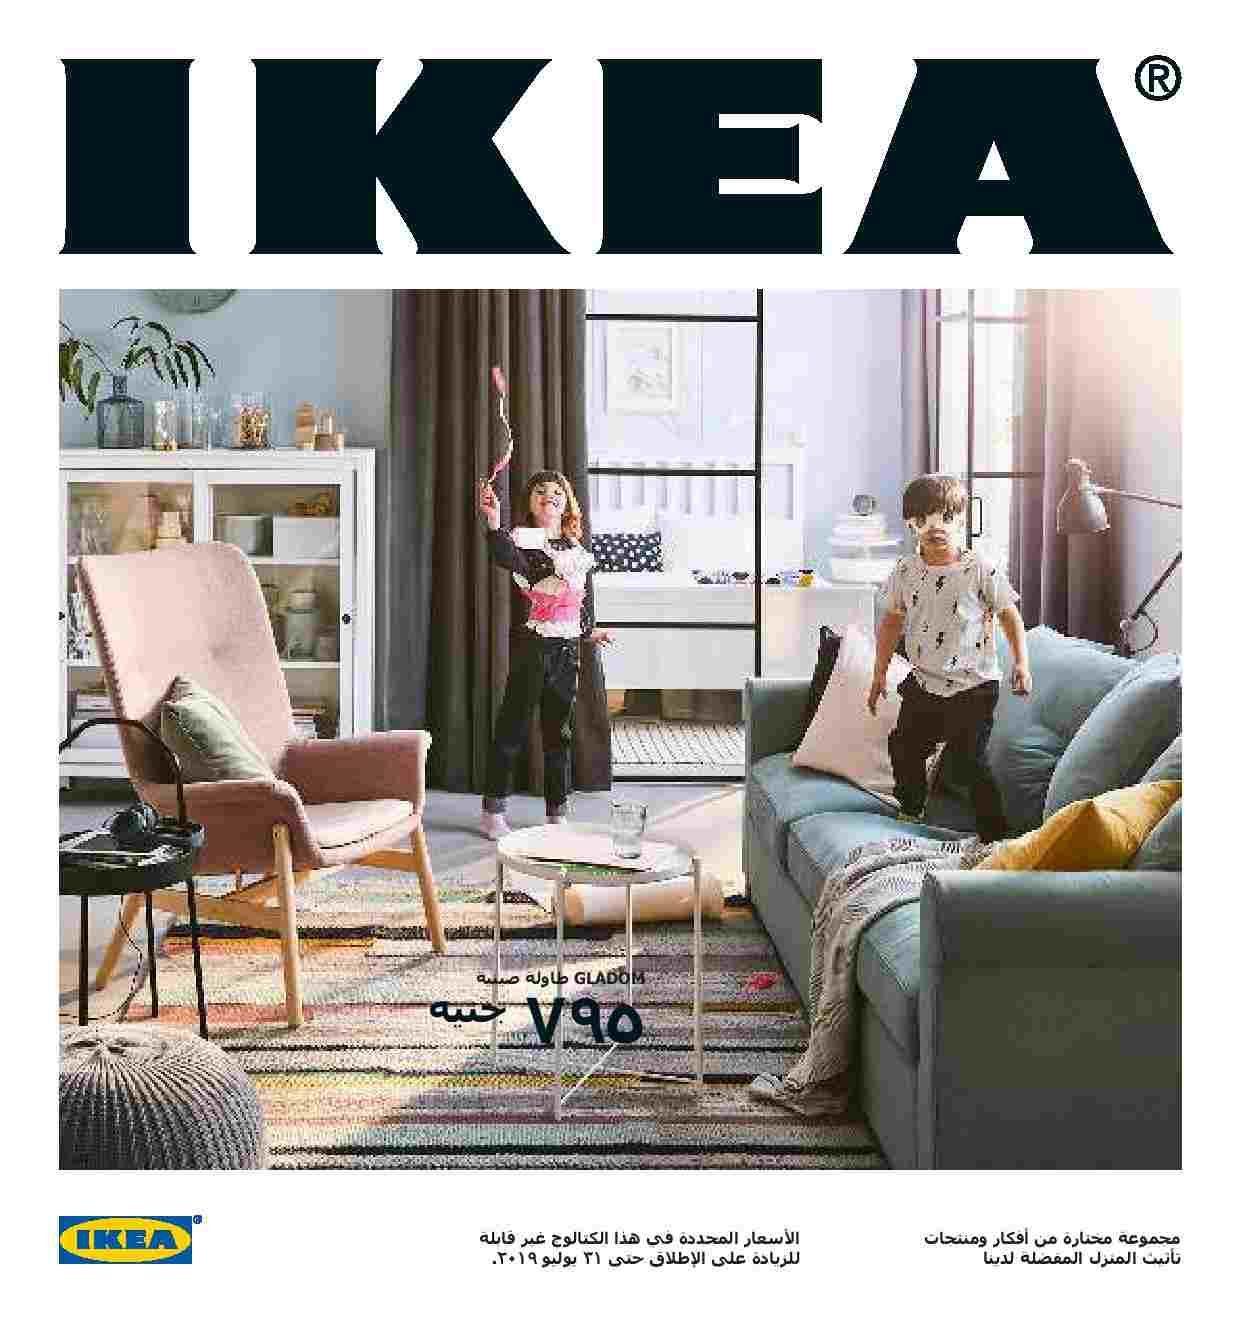 Astonishing Ktaloj Aykya Msr 2019 Aljdyd Ikea Egypt In 2019 Ikea Uwap Interior Chair Design Uwaporg